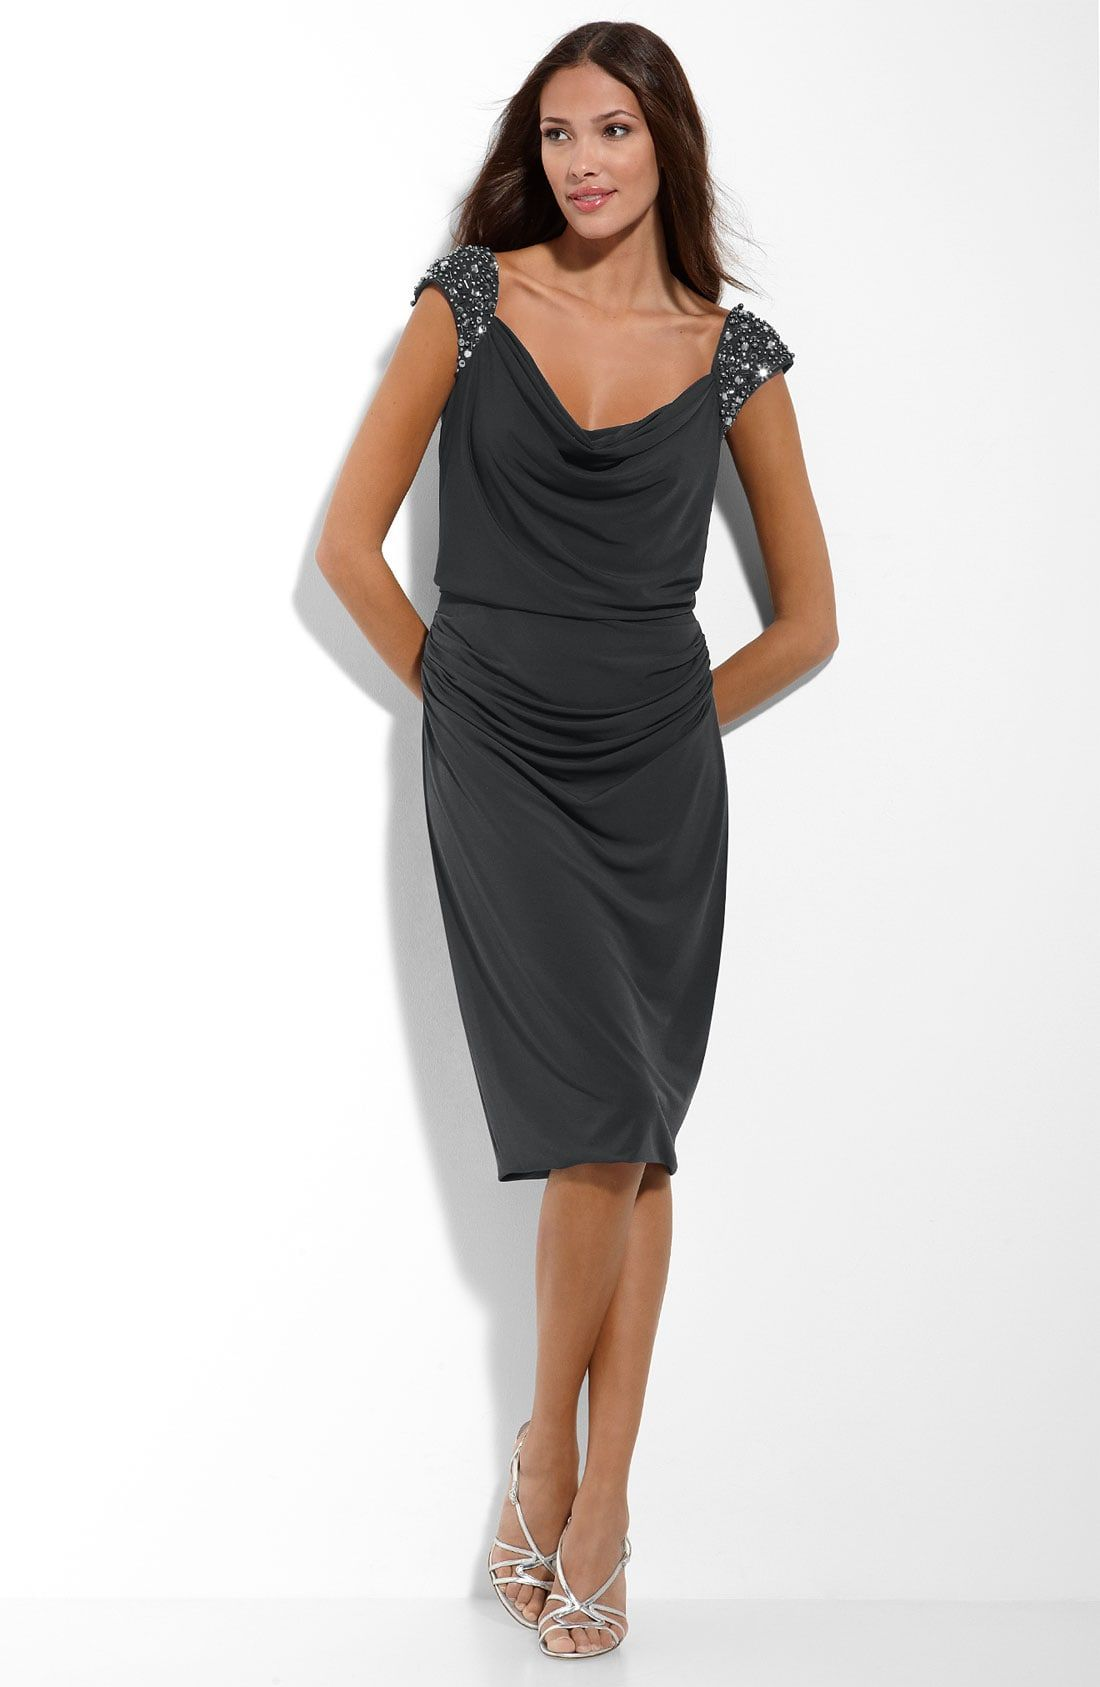 Nordstrom Dress Sabrina Jales Chiffon Cocktail Dress Blouson Dress Dresses [ 1687 x 1100 Pixel ]